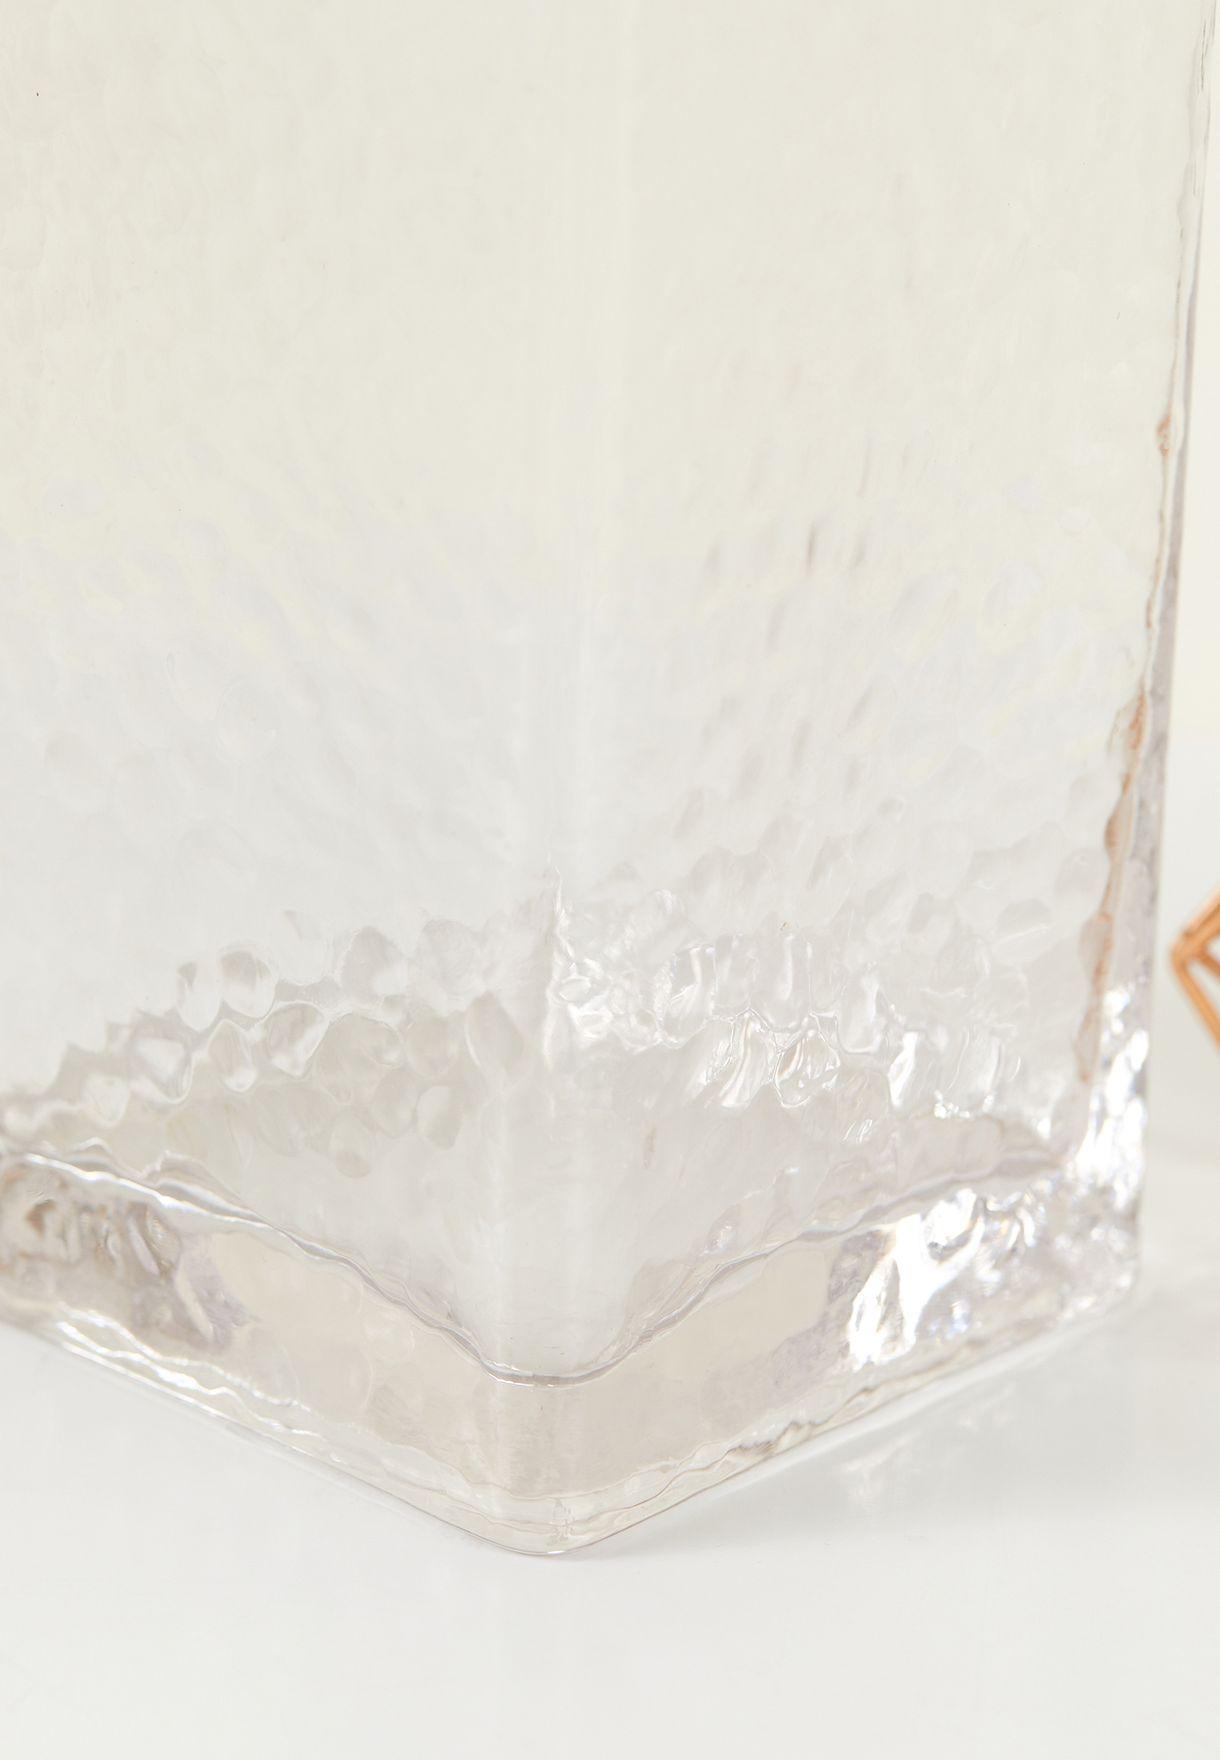 Gold Rim Glass Vase